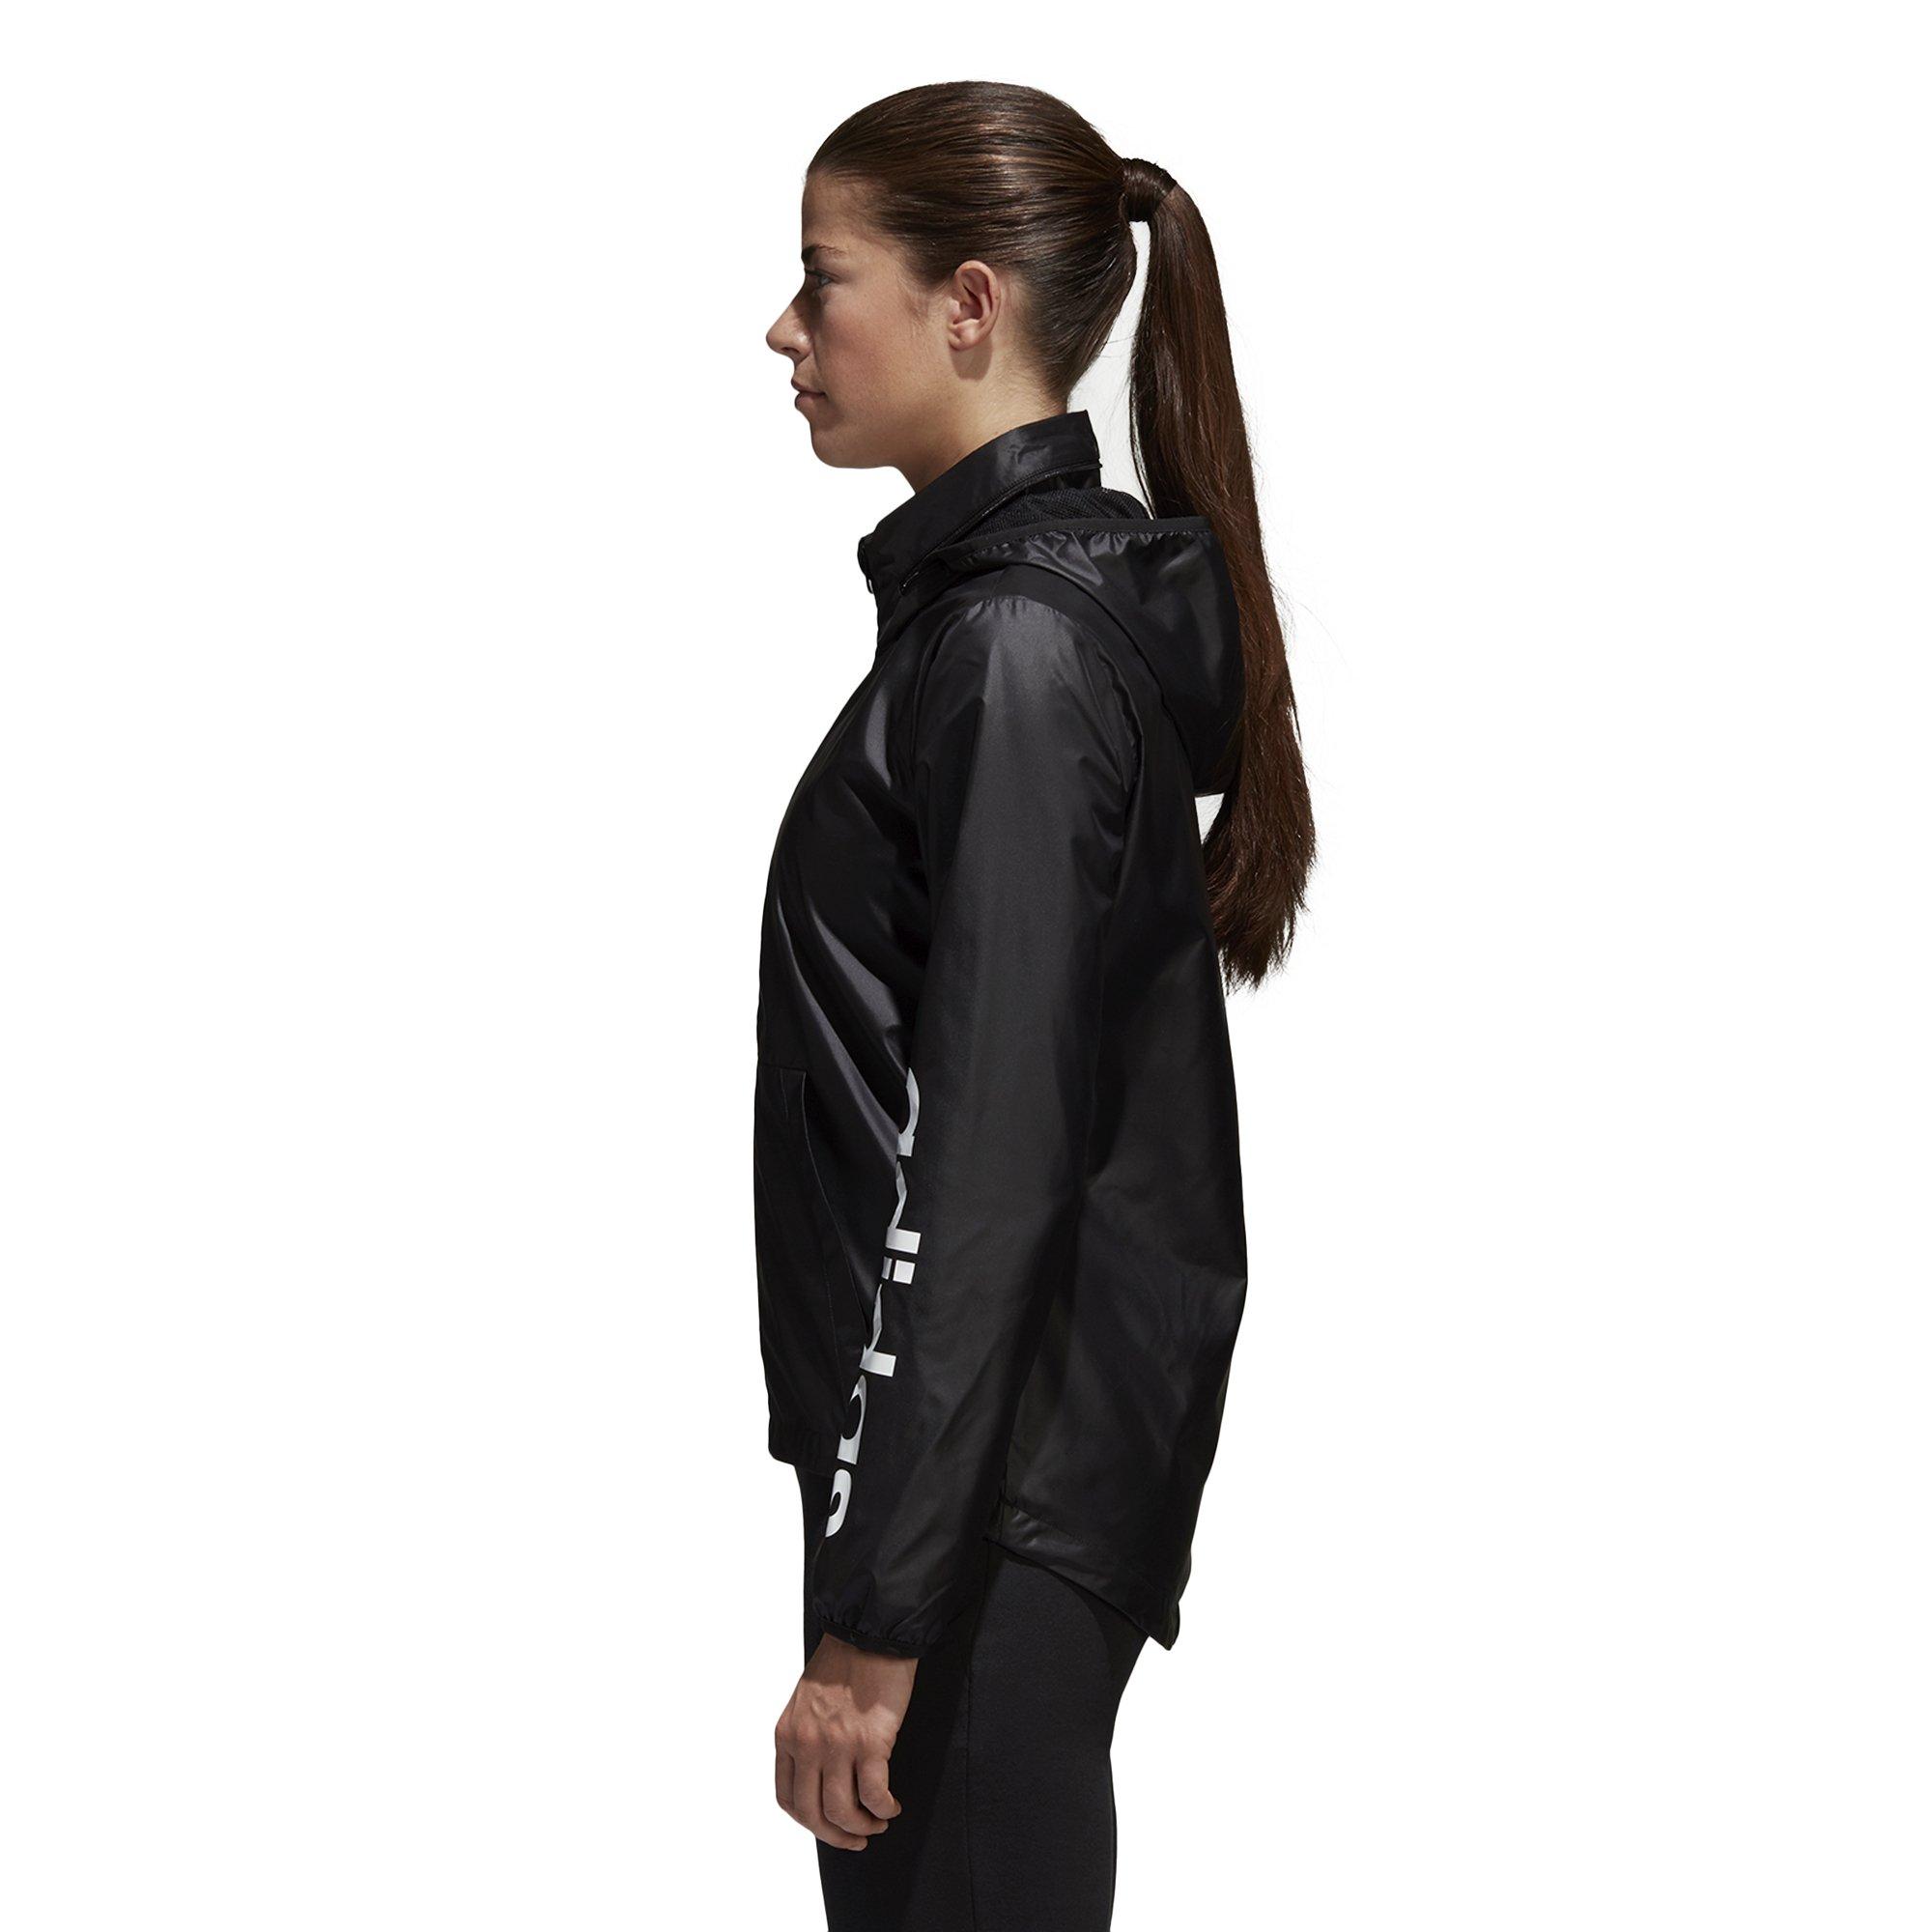 adidas Women's Linear Windbreaker Jacket, Black, Large by adidas (Image #5)